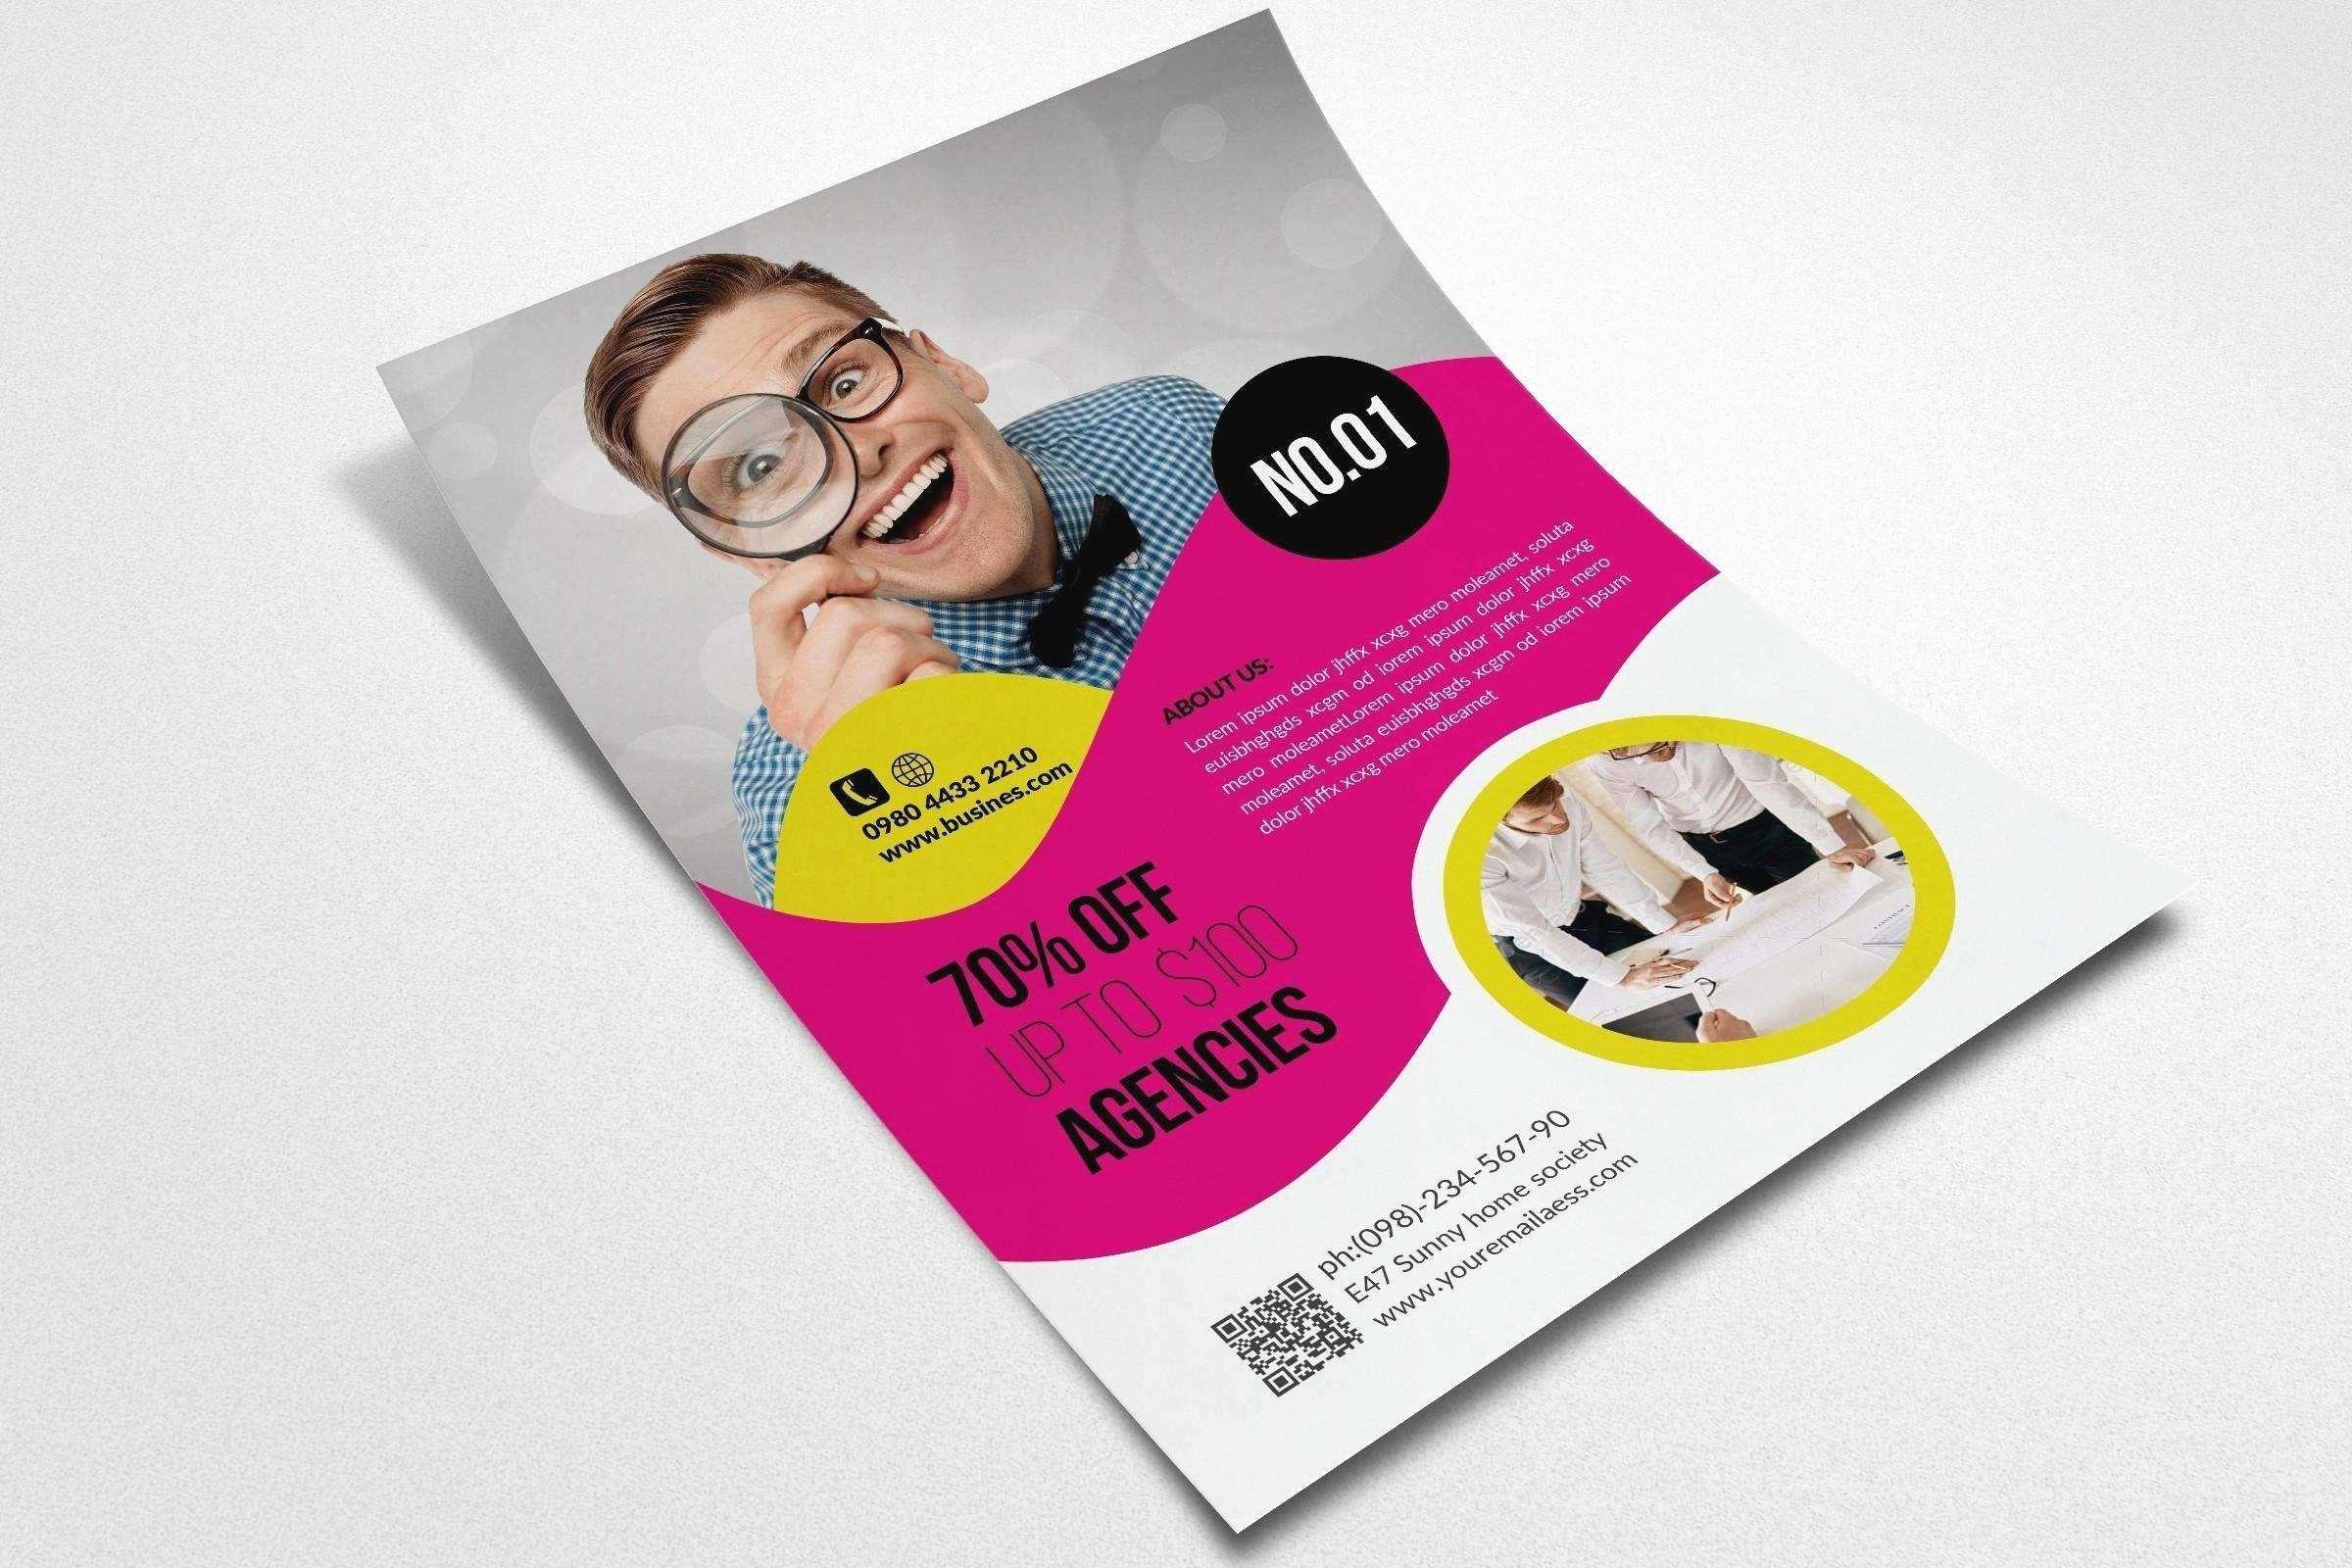 Business Card Illustrator Template Unique Business Card Illustrator Template Caquetapositivo